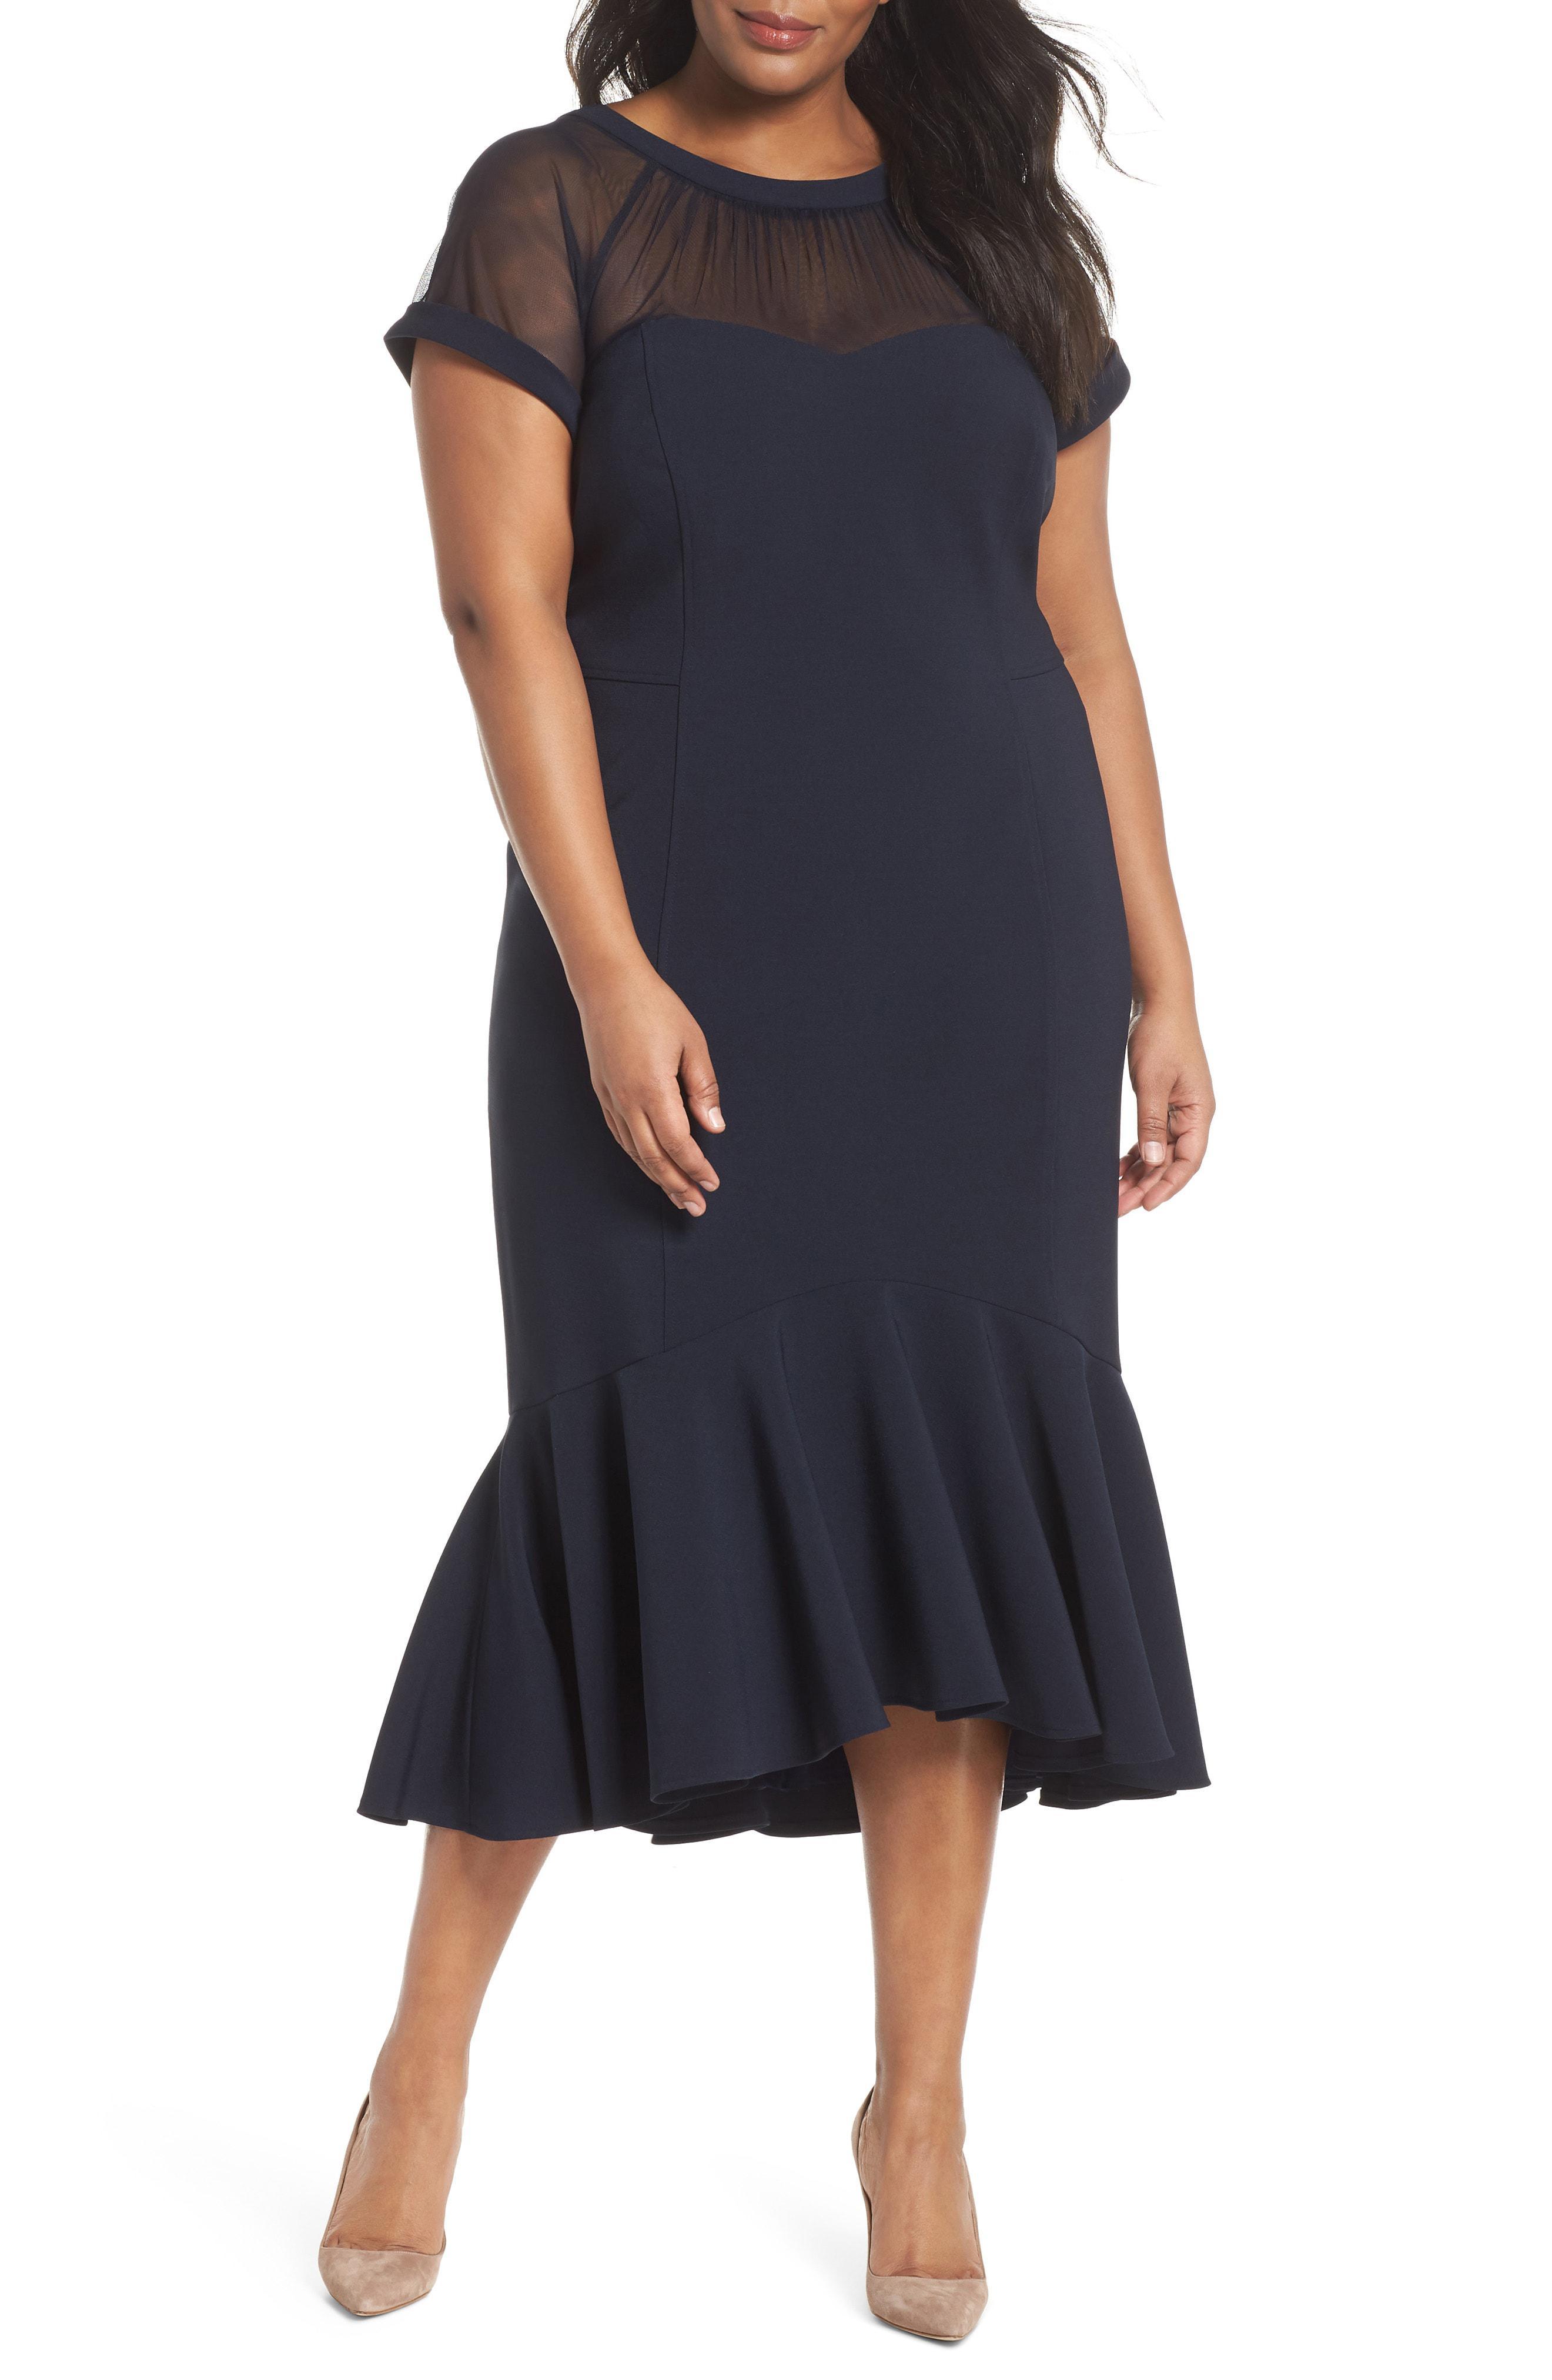 Lyst - Maggy London Illusion Yoke Ruffle Hem Midi Dress in Blue 8387fb851